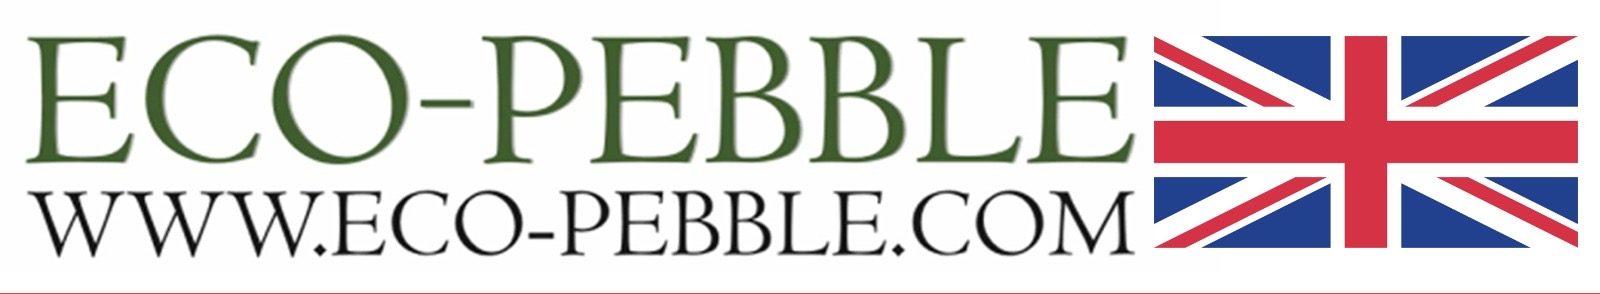 Eco-Pebble